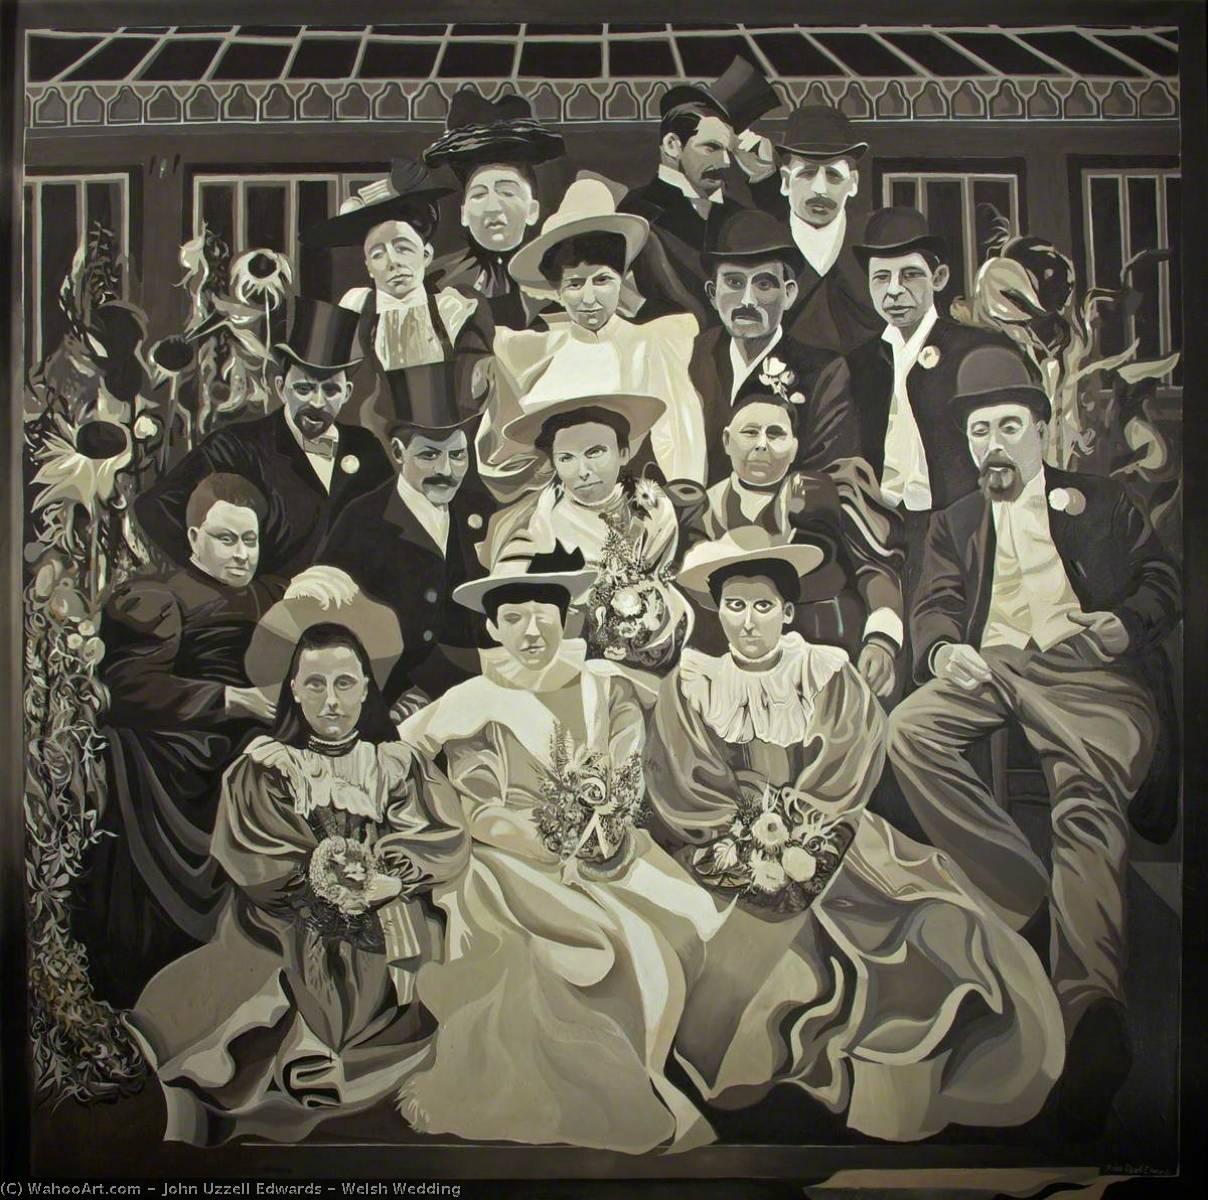 WikiOO.org - دایره المعارف هنرهای زیبا - نقاشی، آثار هنری John Uzzell Edwards - Welsh Wedding